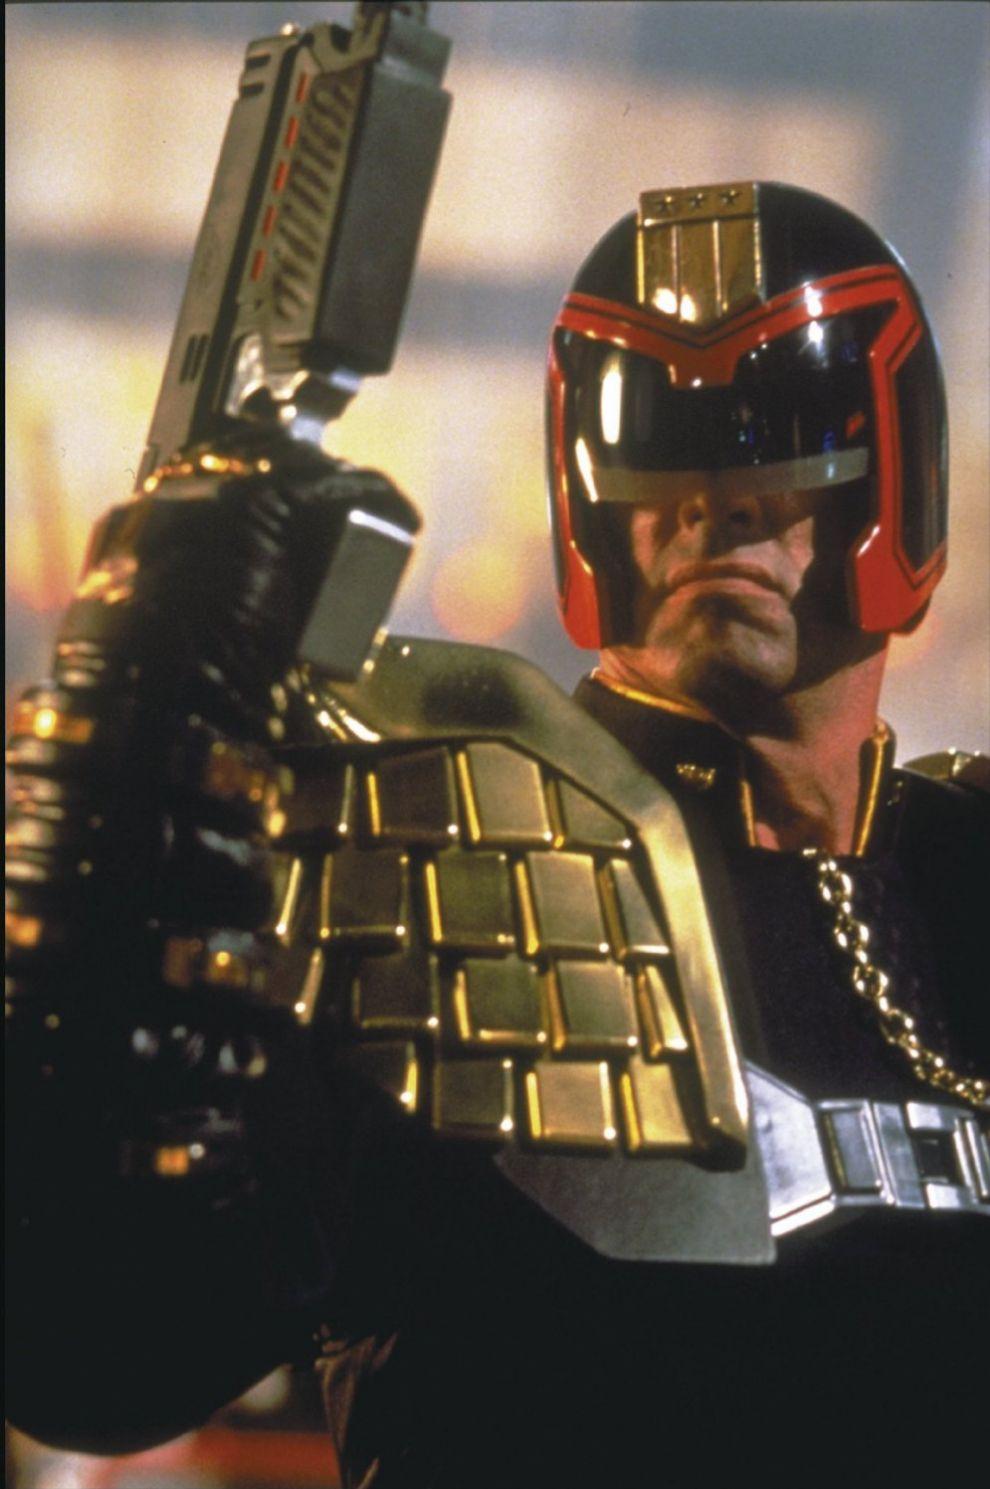 Joseph Dredd, Silvester Stallone en 'Juez Dredd' (1995). Año 2139. La...